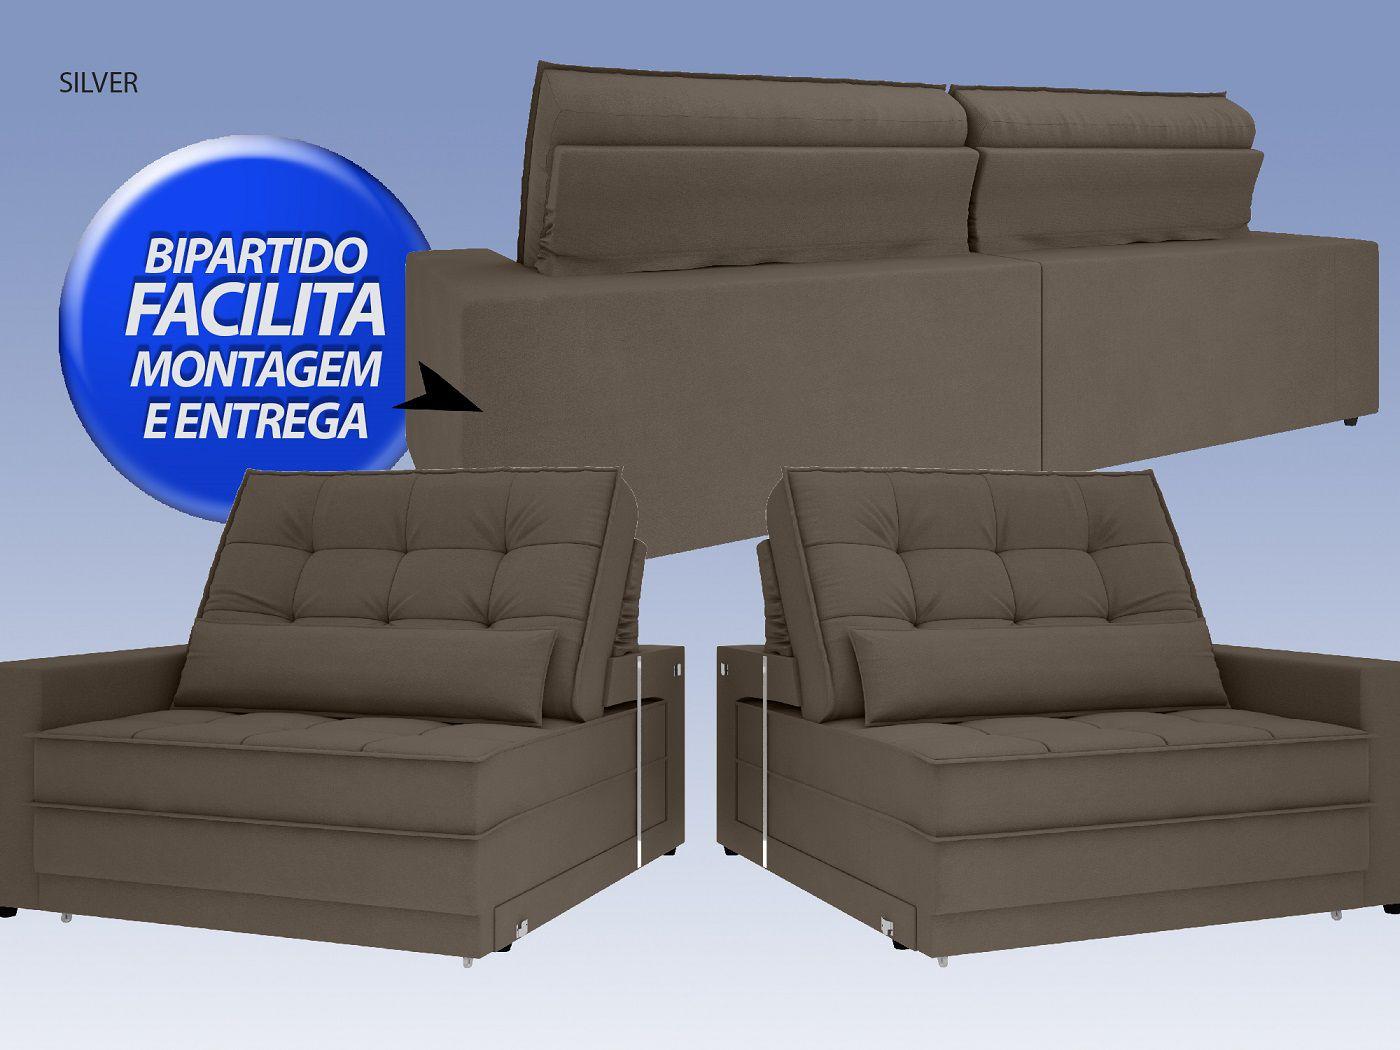 Sofá Silver 2,80m Retrátil e Reclinável Velosuede Marrom - NETSOFAS